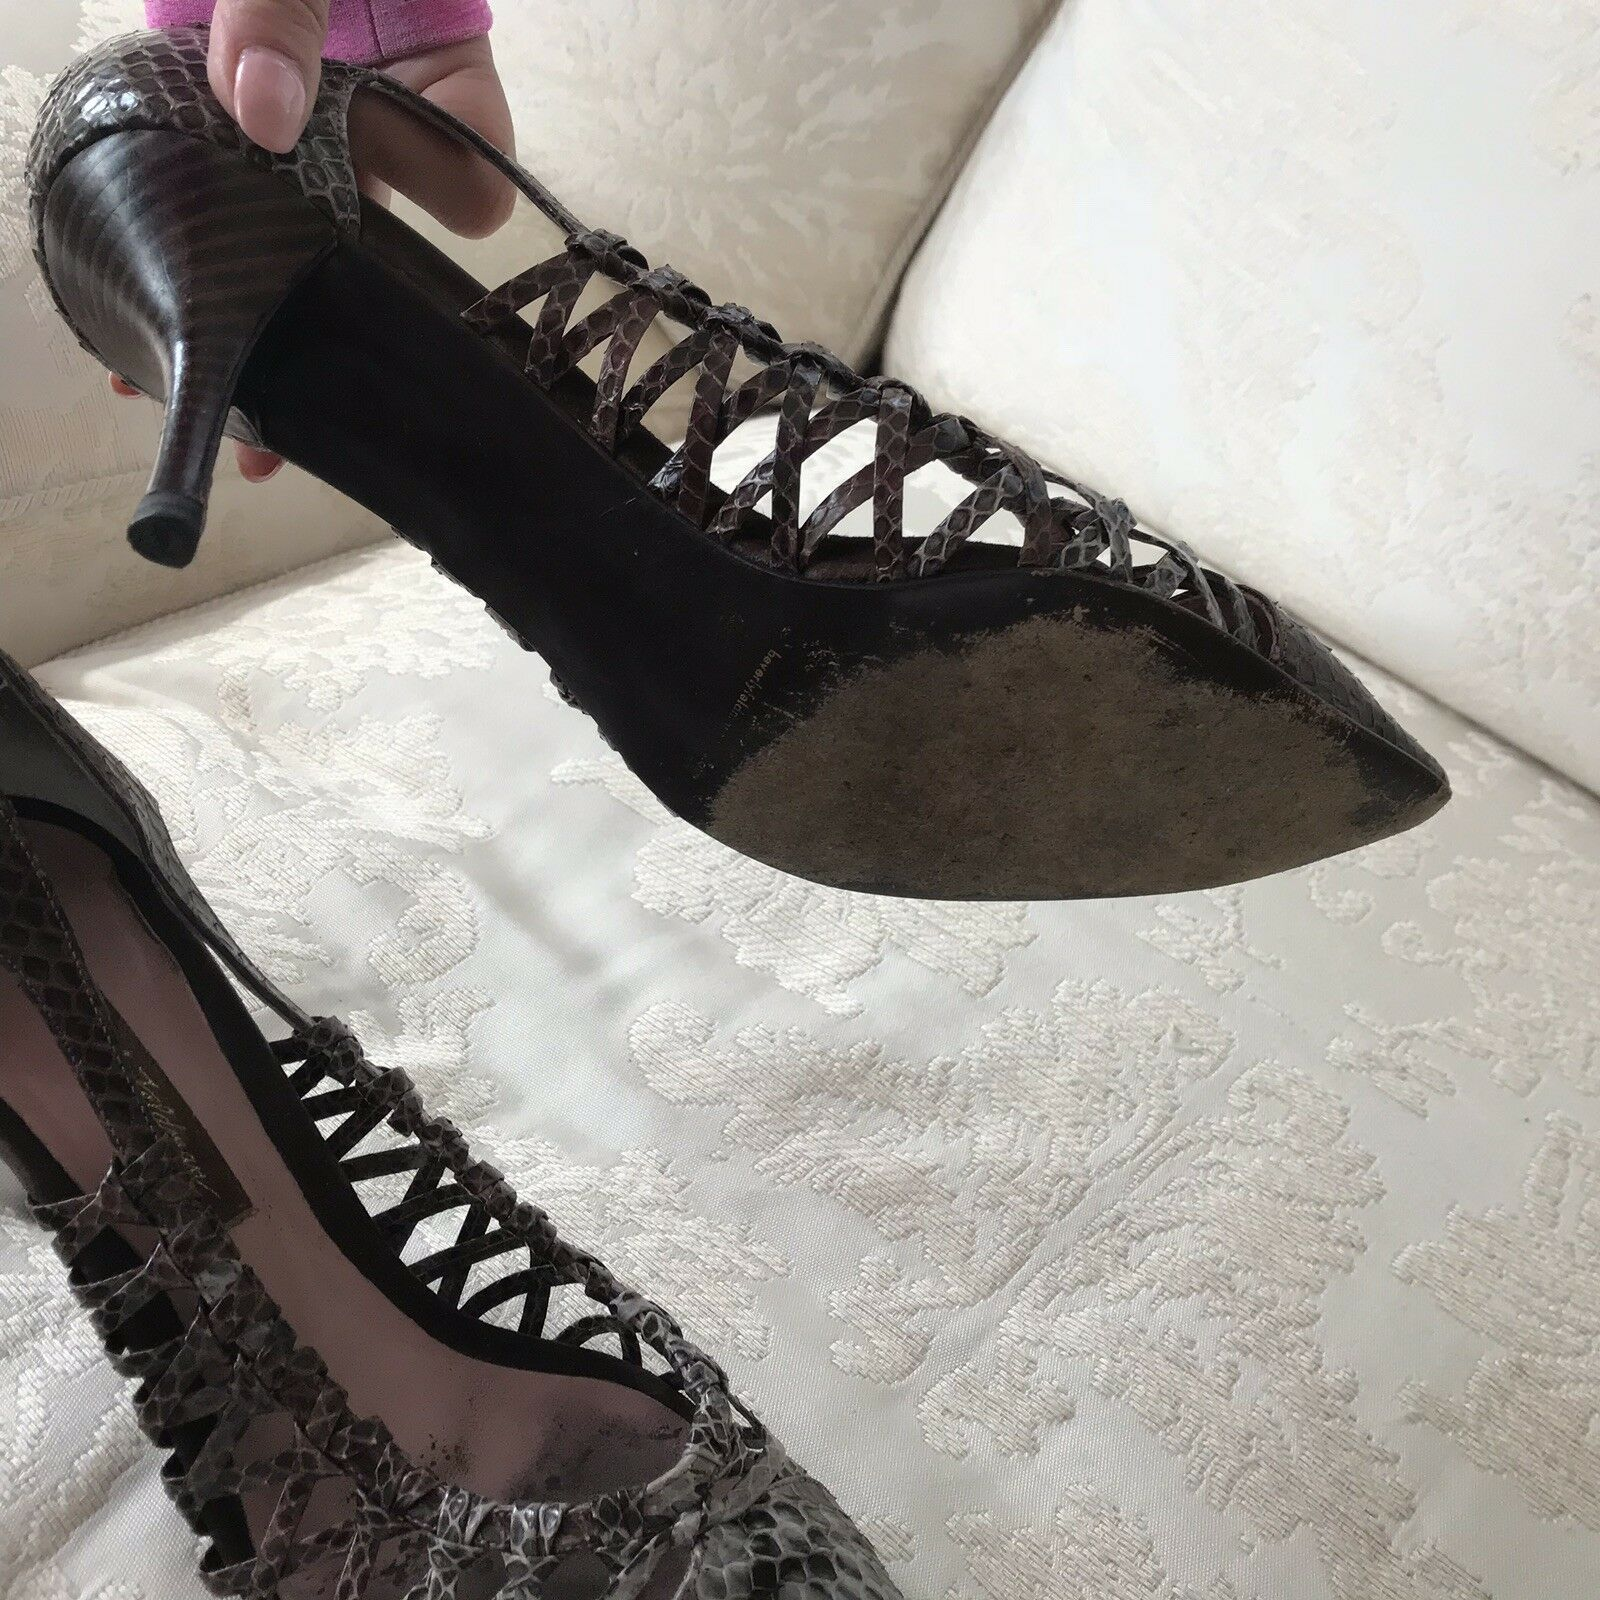 Beverly Feldman Snakeskin Snakeskin Snakeskin Leather Pumps schuhe Pointed Heels 11 M 11M 25ba96